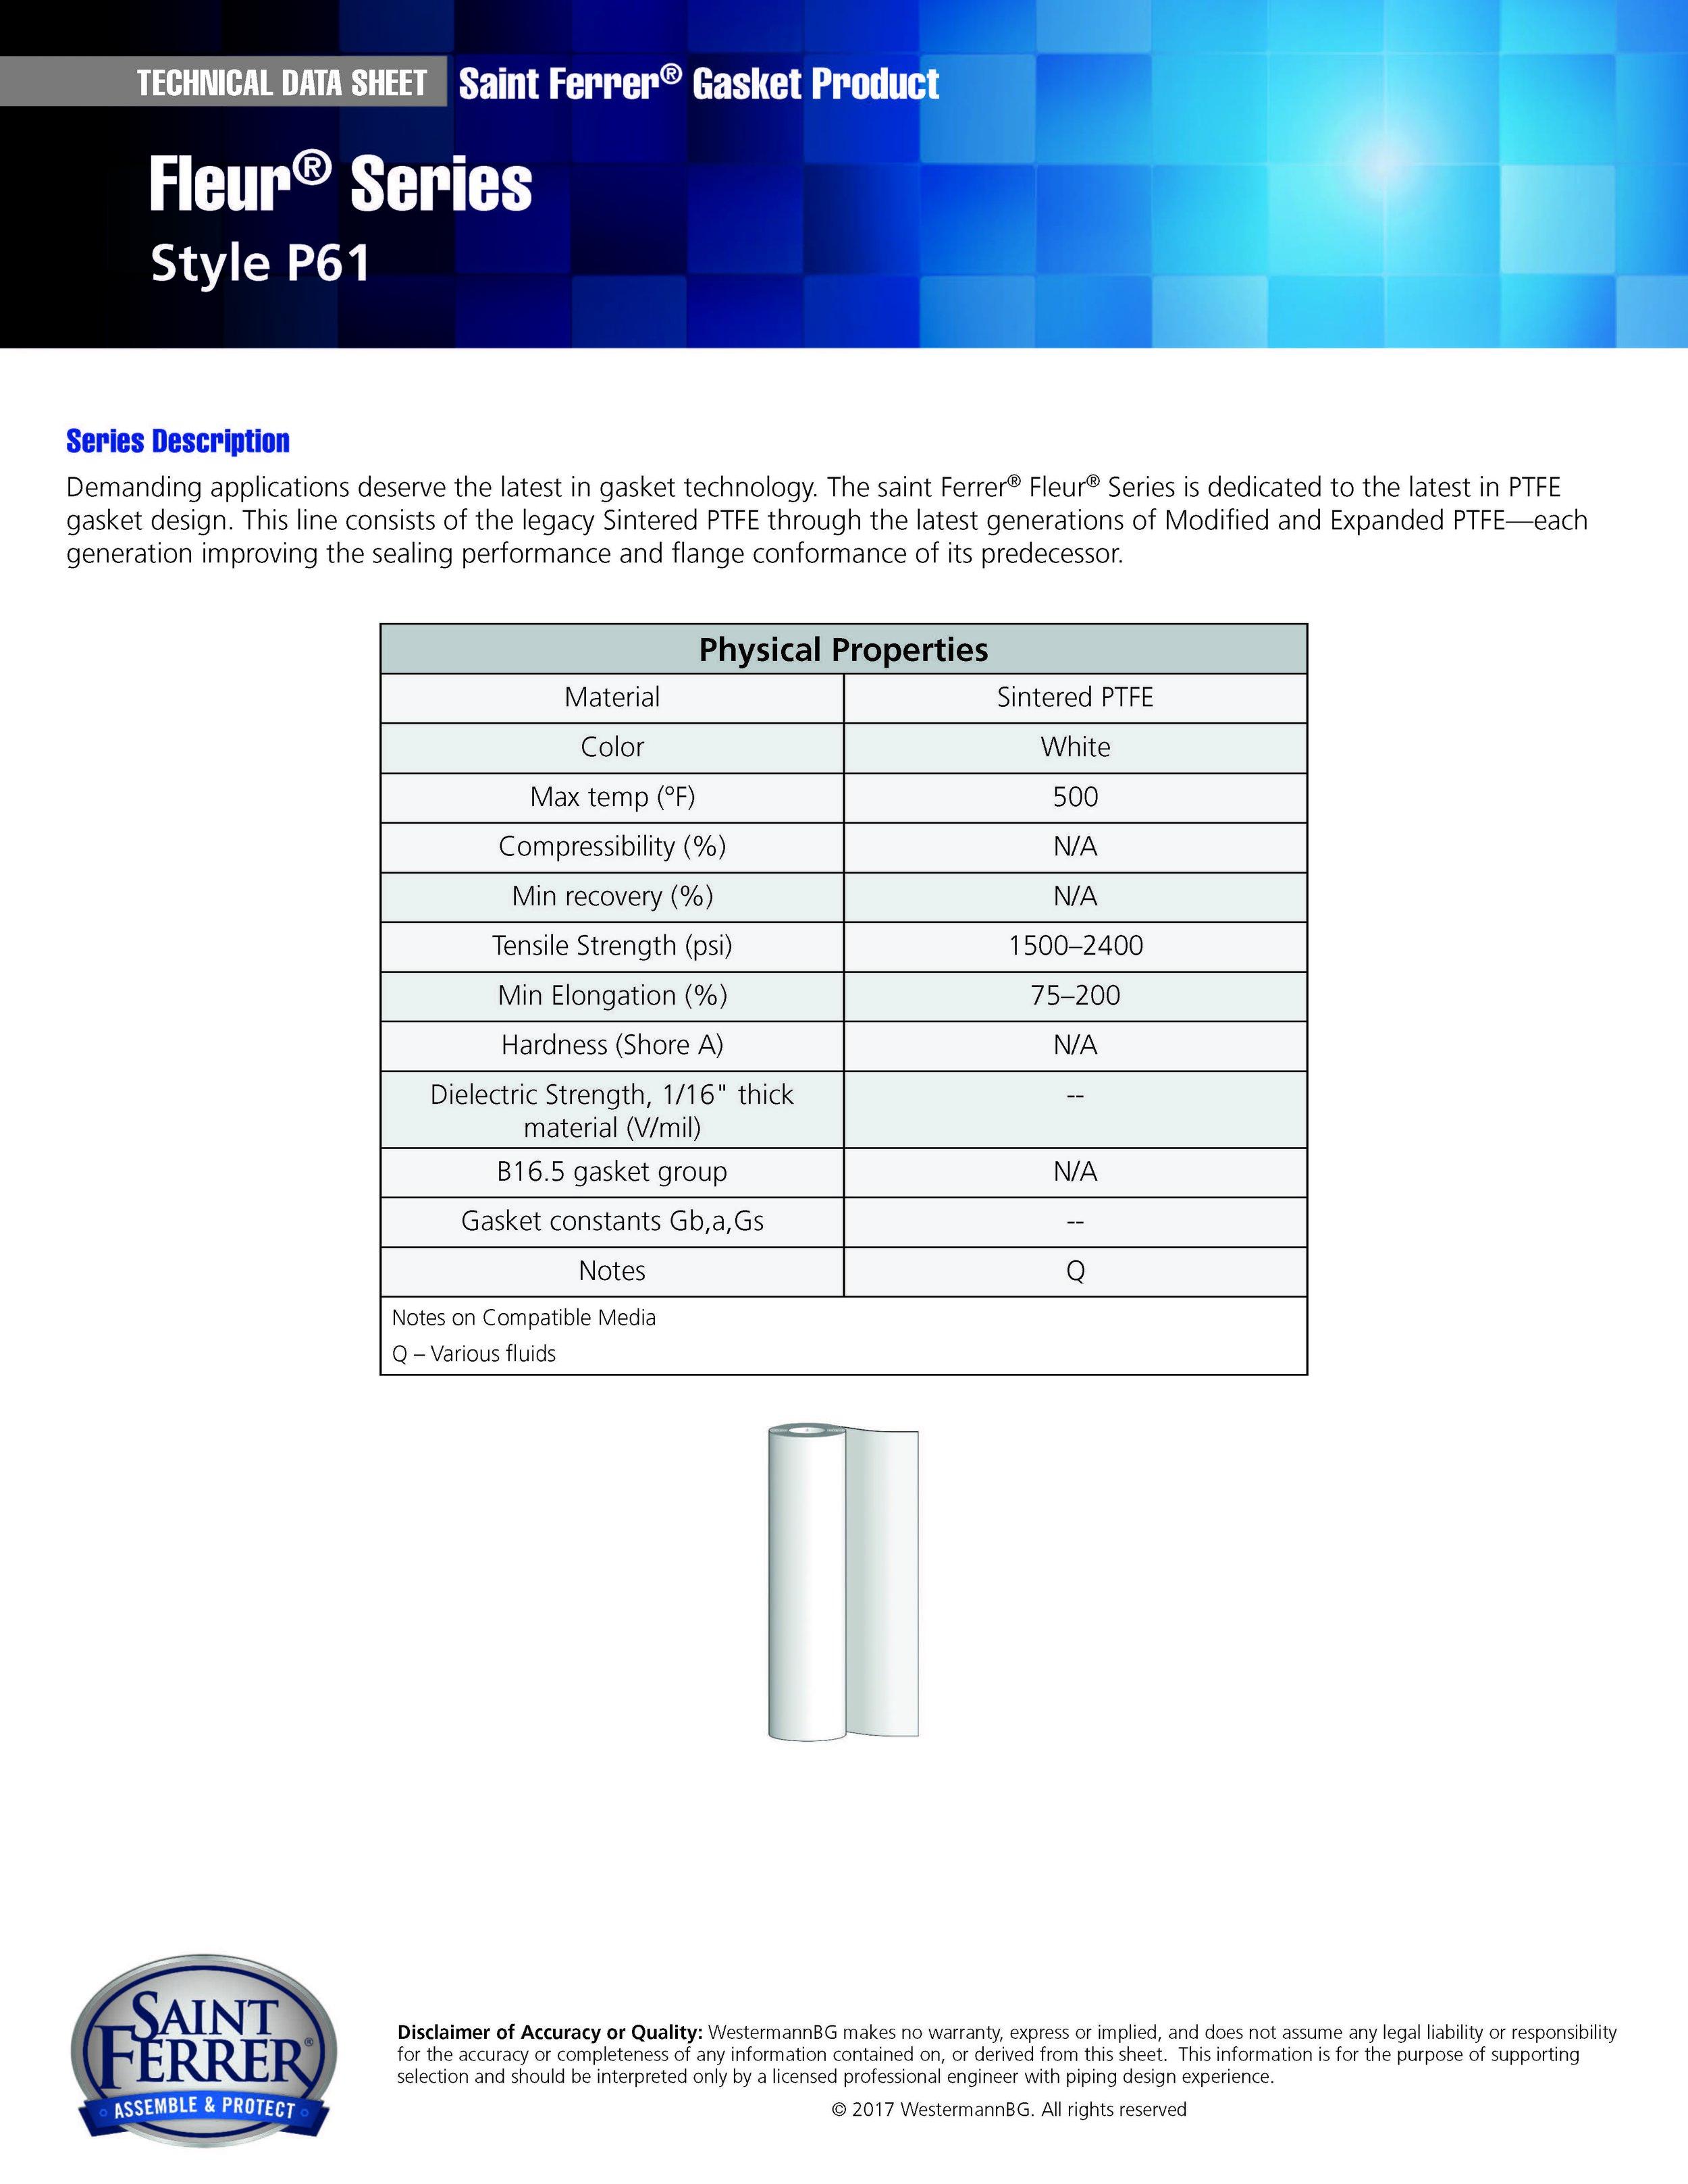 SF_Data_Sheet_Gaskets_FLEUR-P61.jpg